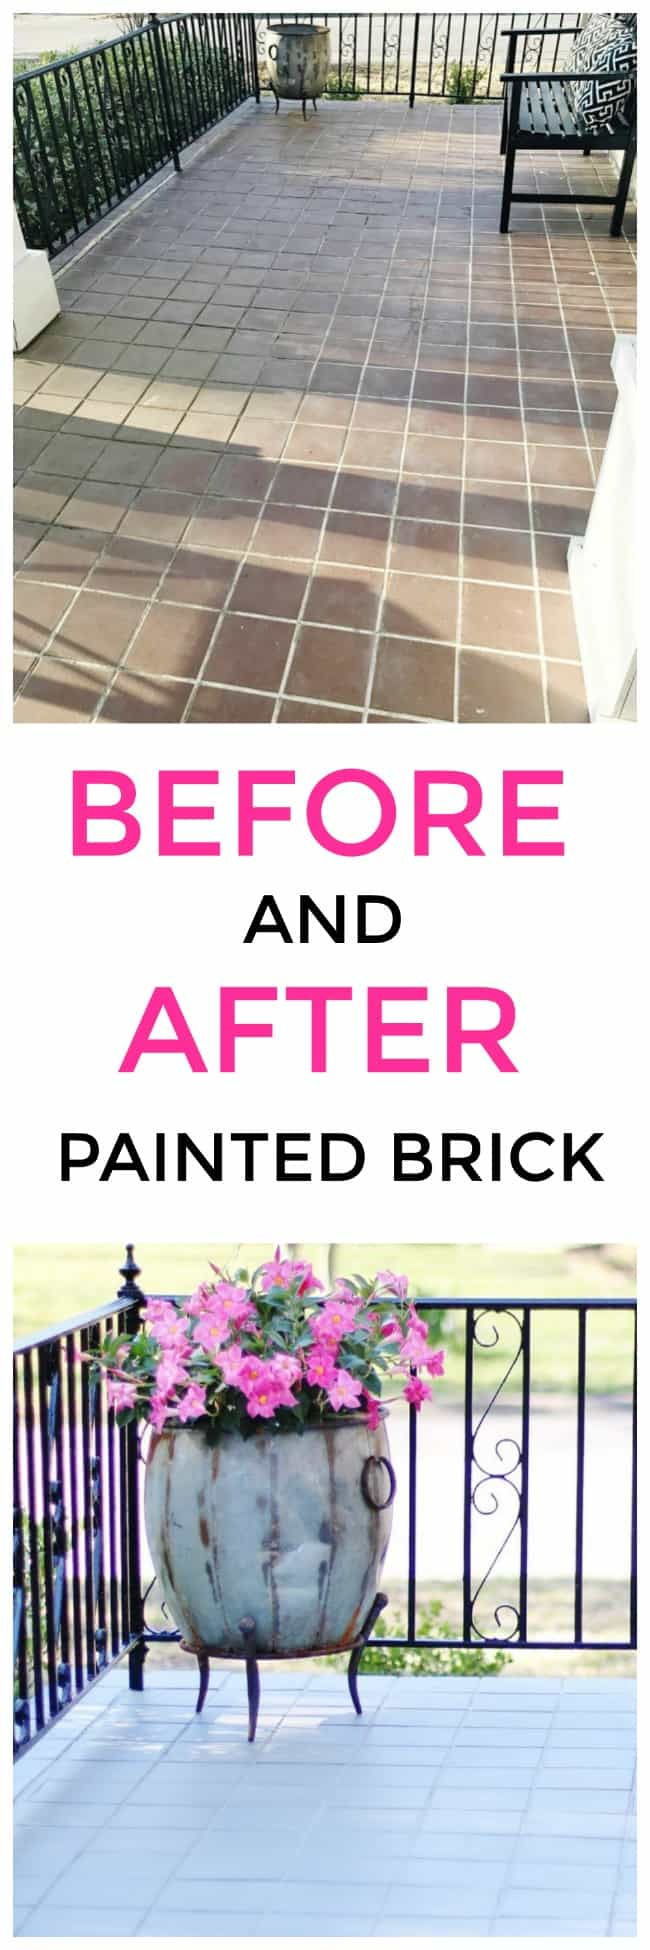 painted brick promo graphic